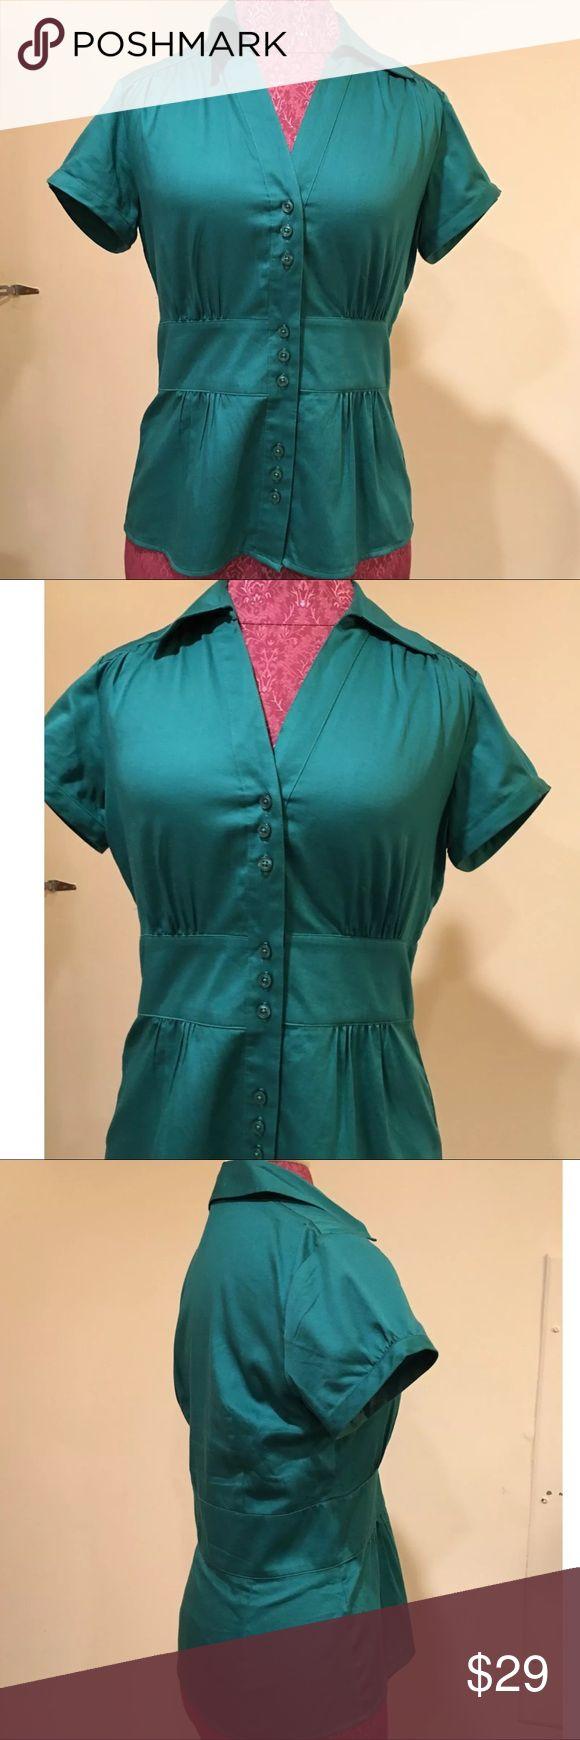 Ann Taylor Loft Outlet Green Button Down Top Sz 4 Ann Taylor Loft Size ~ 4 Material ~ 100% cotton Shoulders ~ 14 Arm ~ 6 Chest ~ 18 Length ~ 25 Buttons ~ 9 Emerald green Ann Taylor Factory Tops Blouses